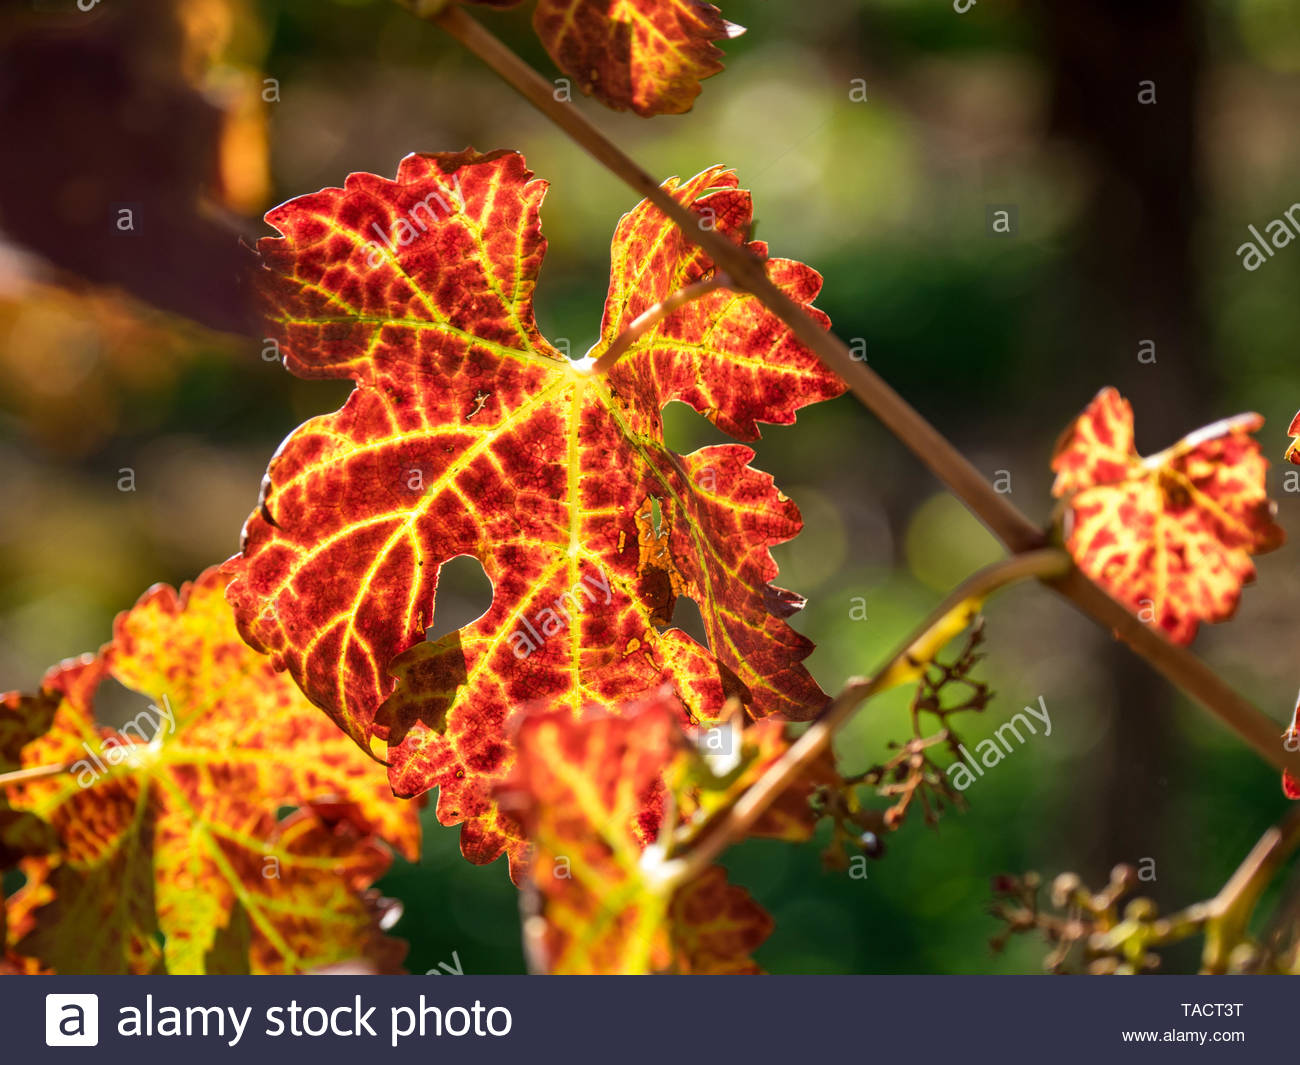 Autumn Leaves in the vineyard. Barmera, South Australia. Golden glow. - Stock Image